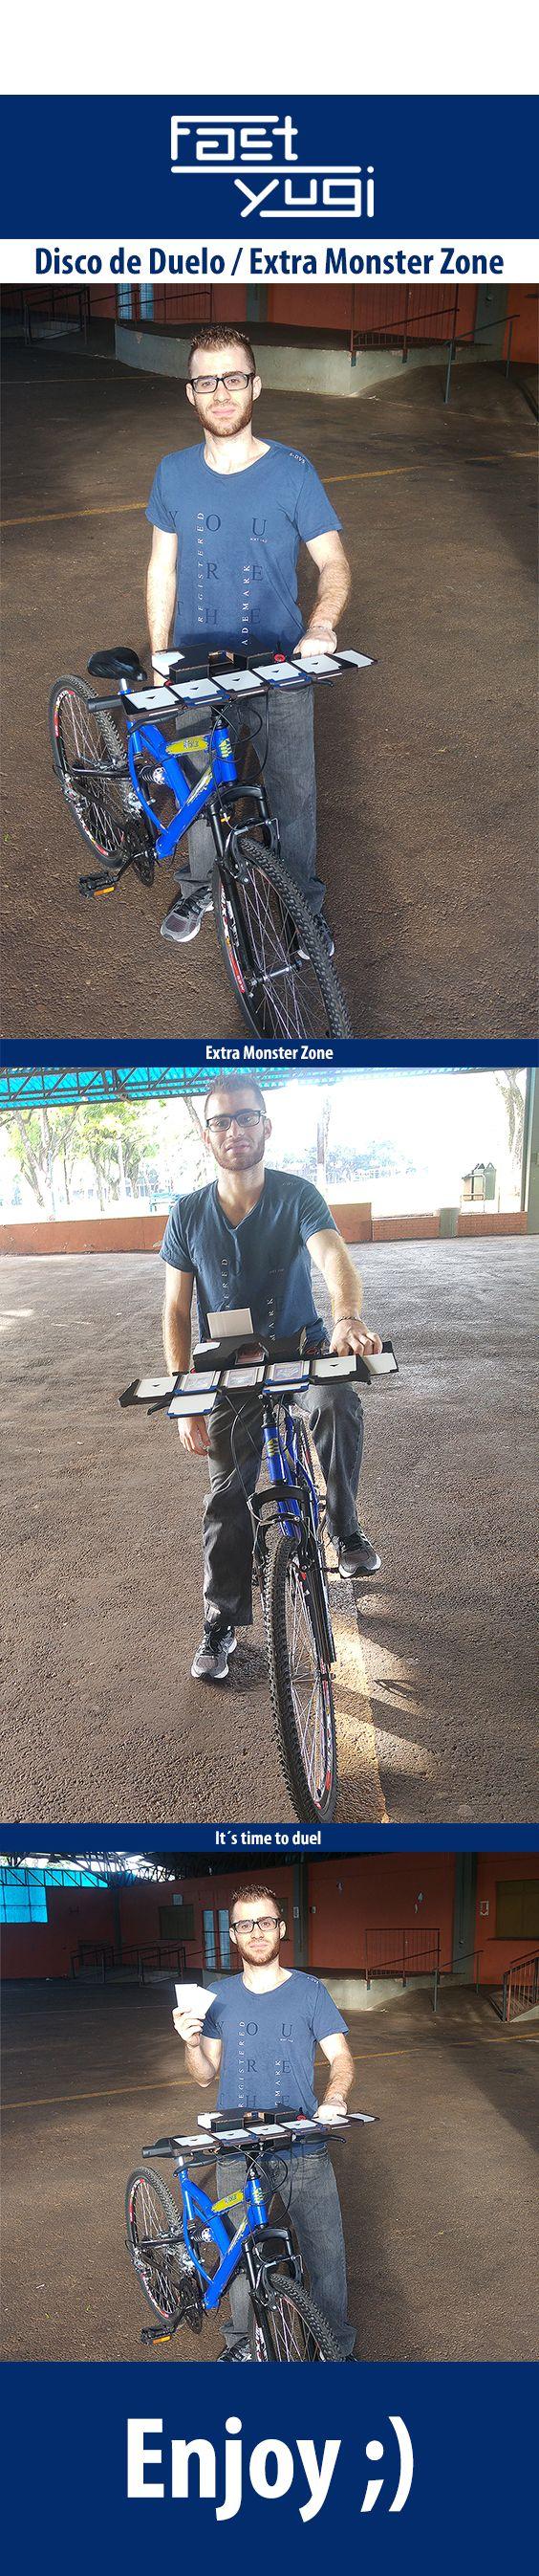 Duel Disk in the Bike  MDF 3 mm -   Download:  https://drive.google.com/file/d/1E-FSXhWpwAAGLSY-ZK6gvDCZyxpN1jCR/view